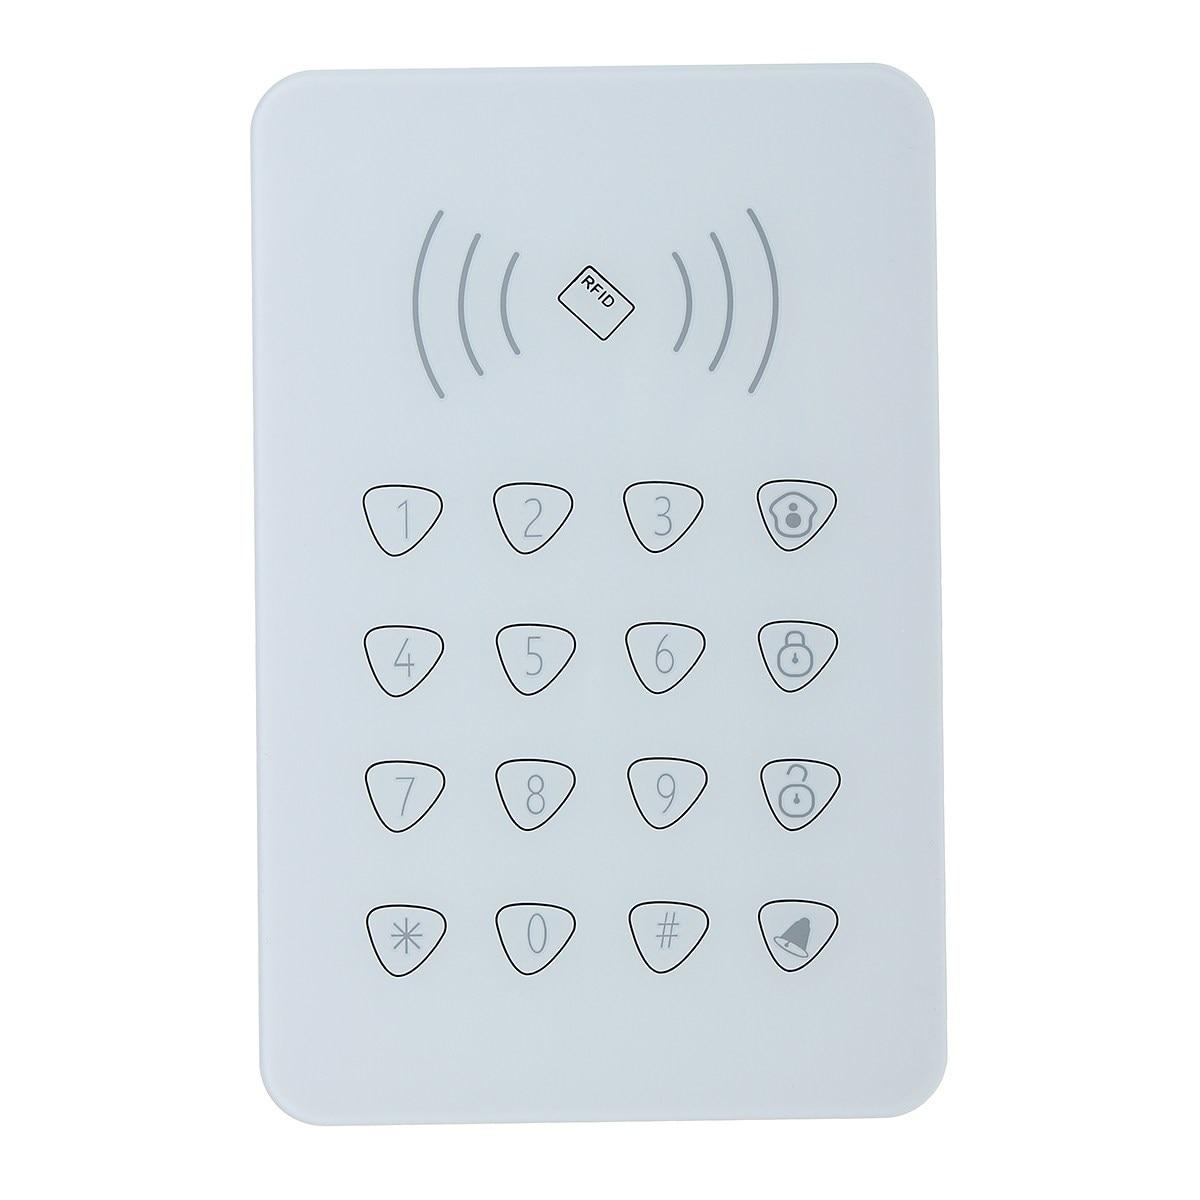 Safurance Wireless Touch Keypad  Alarm Sensors Accessories G90B For WiFi GSM Home Intruder Security Alarm Mainframe Kits wireless smoke fire detector for wireless for touch keypad panel wifi gsm home security burglar voice alarm system